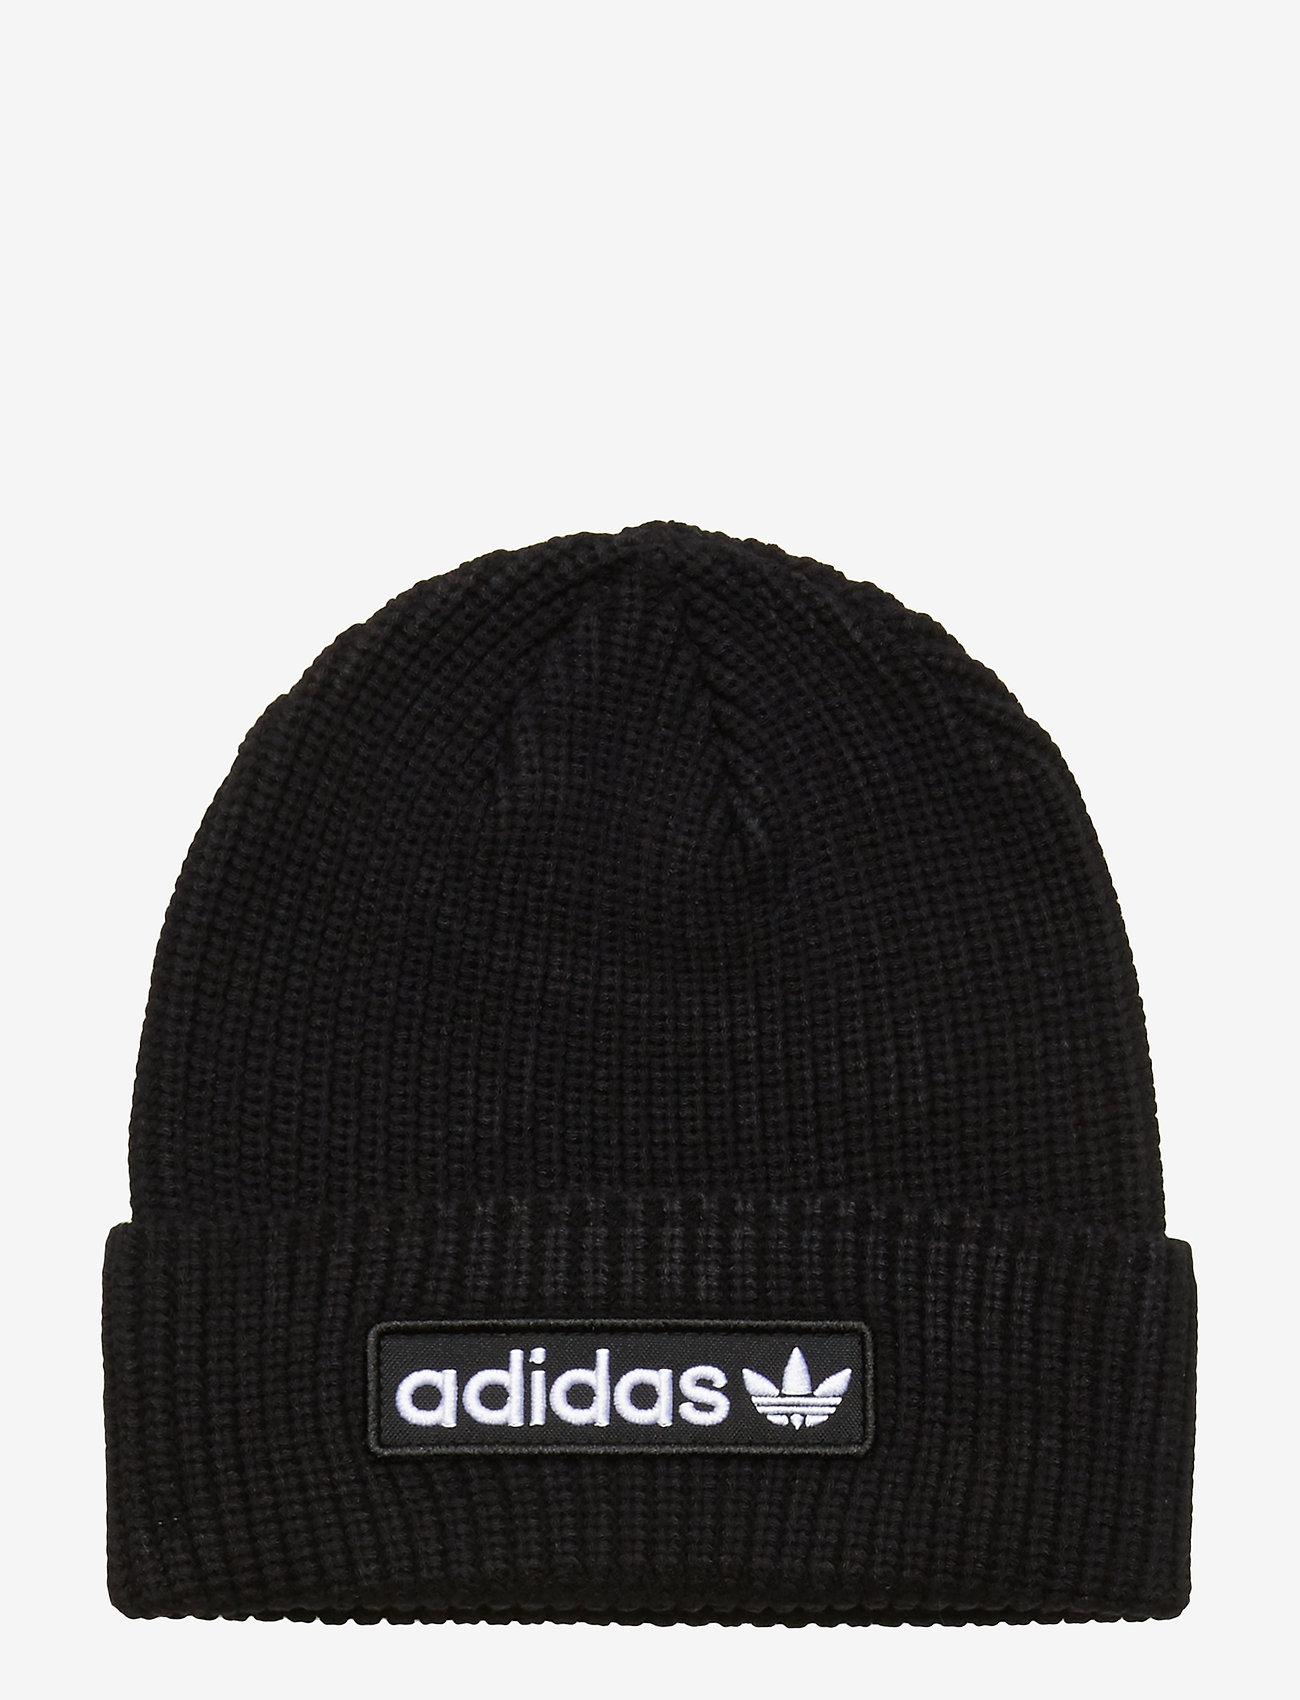 adidas Originals - W RIB BEANIE - huer - black/white